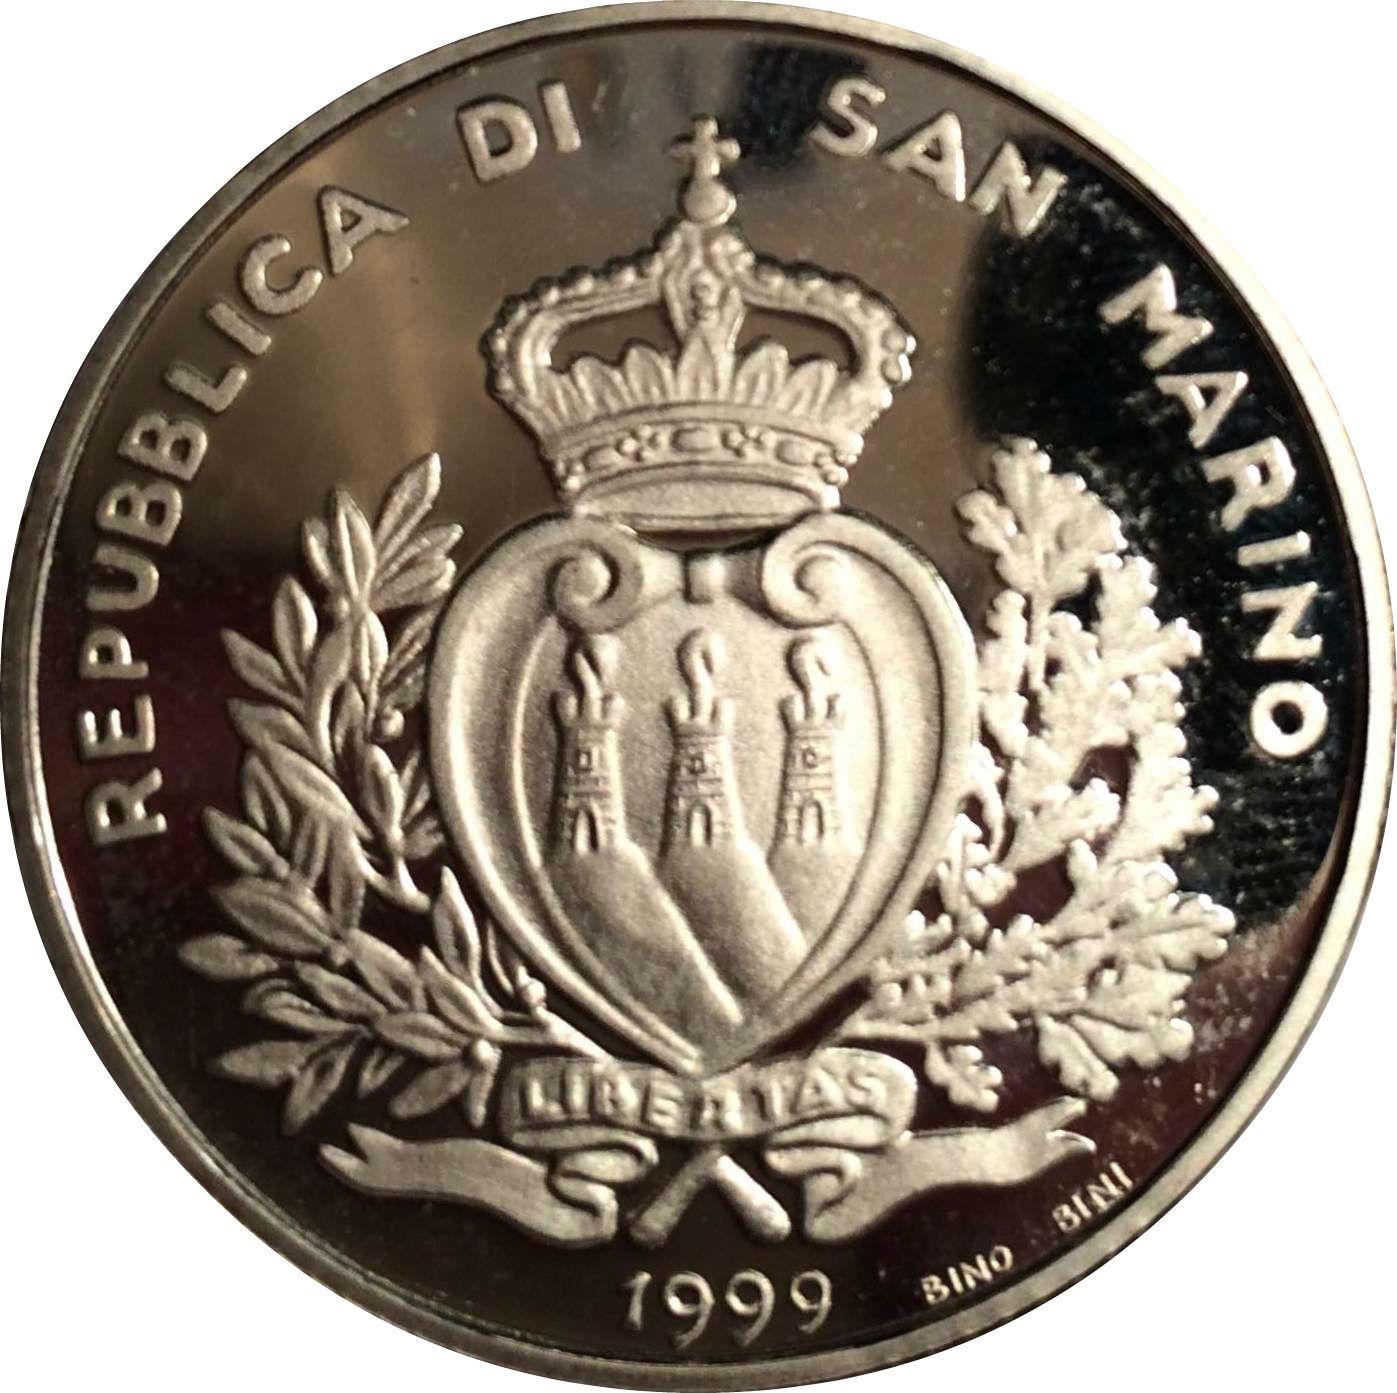 THIRD MILLENNIUM coin SAN MARINO 10000 LIRE 1999 SILVER Comm PROOF KM# 397